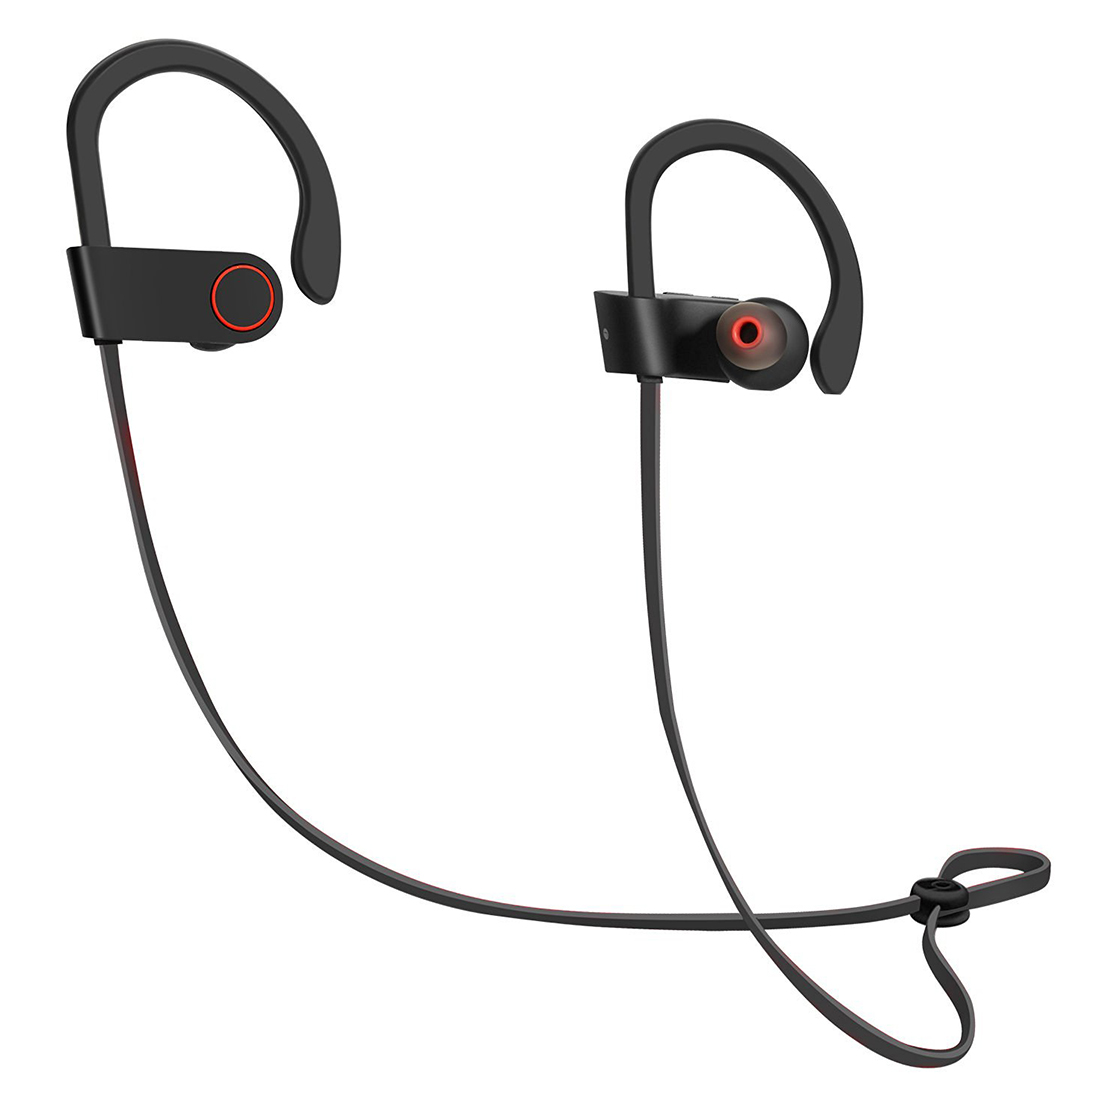 Wireless Headphones Bluetooth Earbuds Sweatproof In Ear Secure Fit Earphones Loud Bass Noise Reduction with Mic